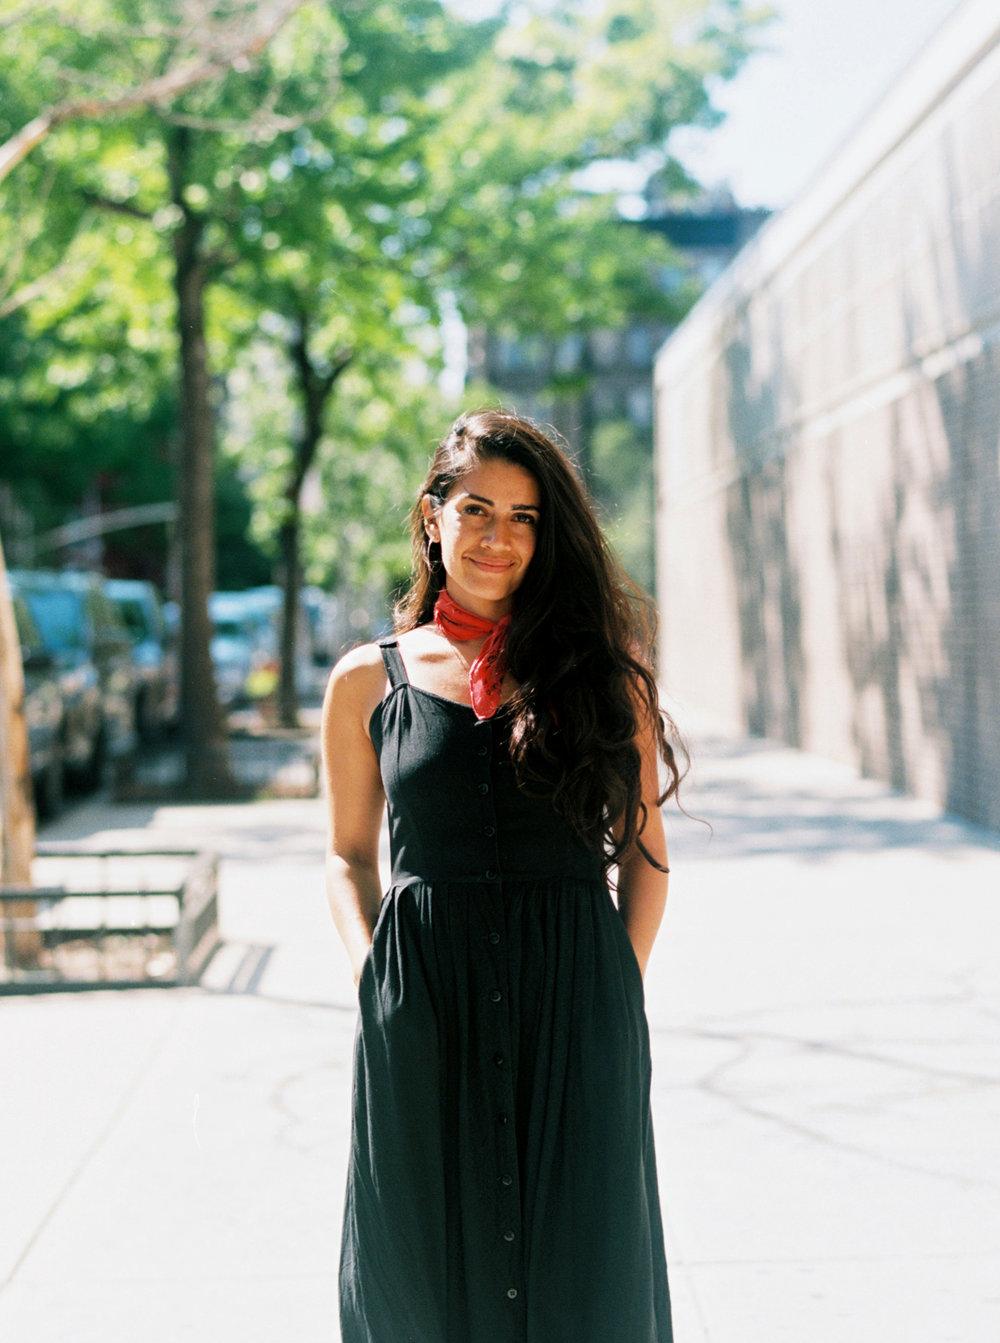 Diana Zapata, Photographer